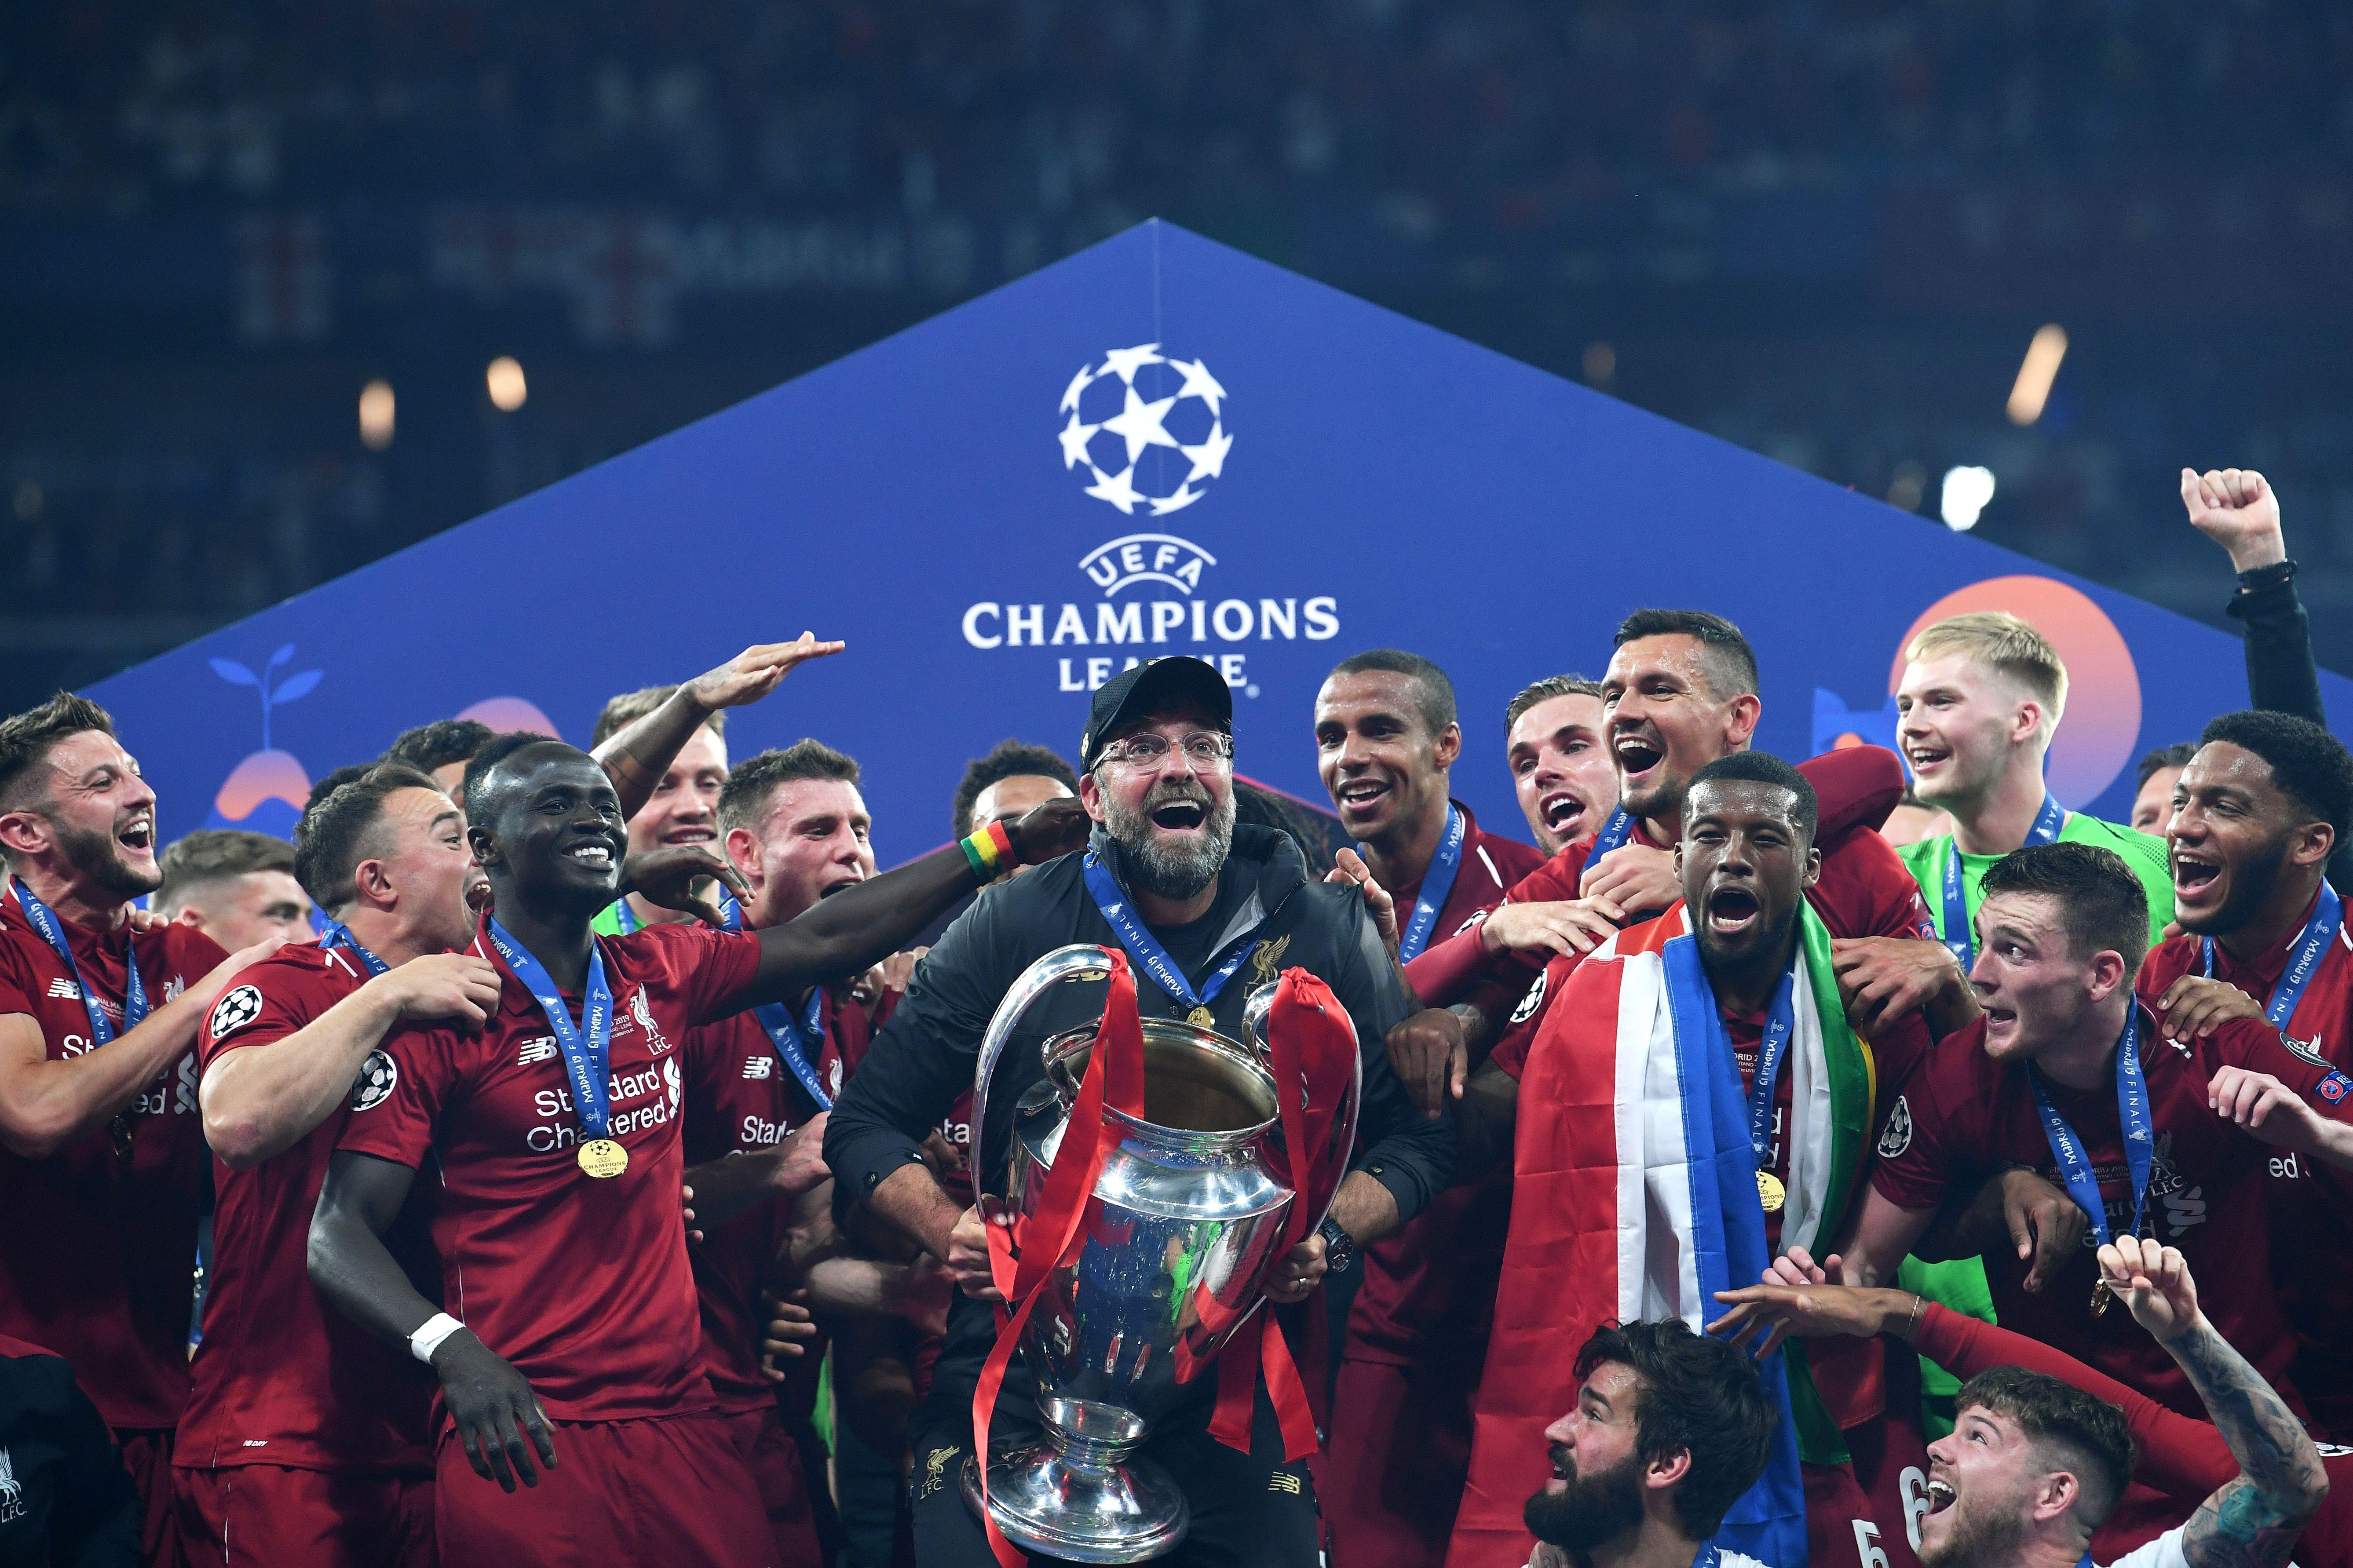 https://i.eurosport.com/2019/06/01/2604220.jpg